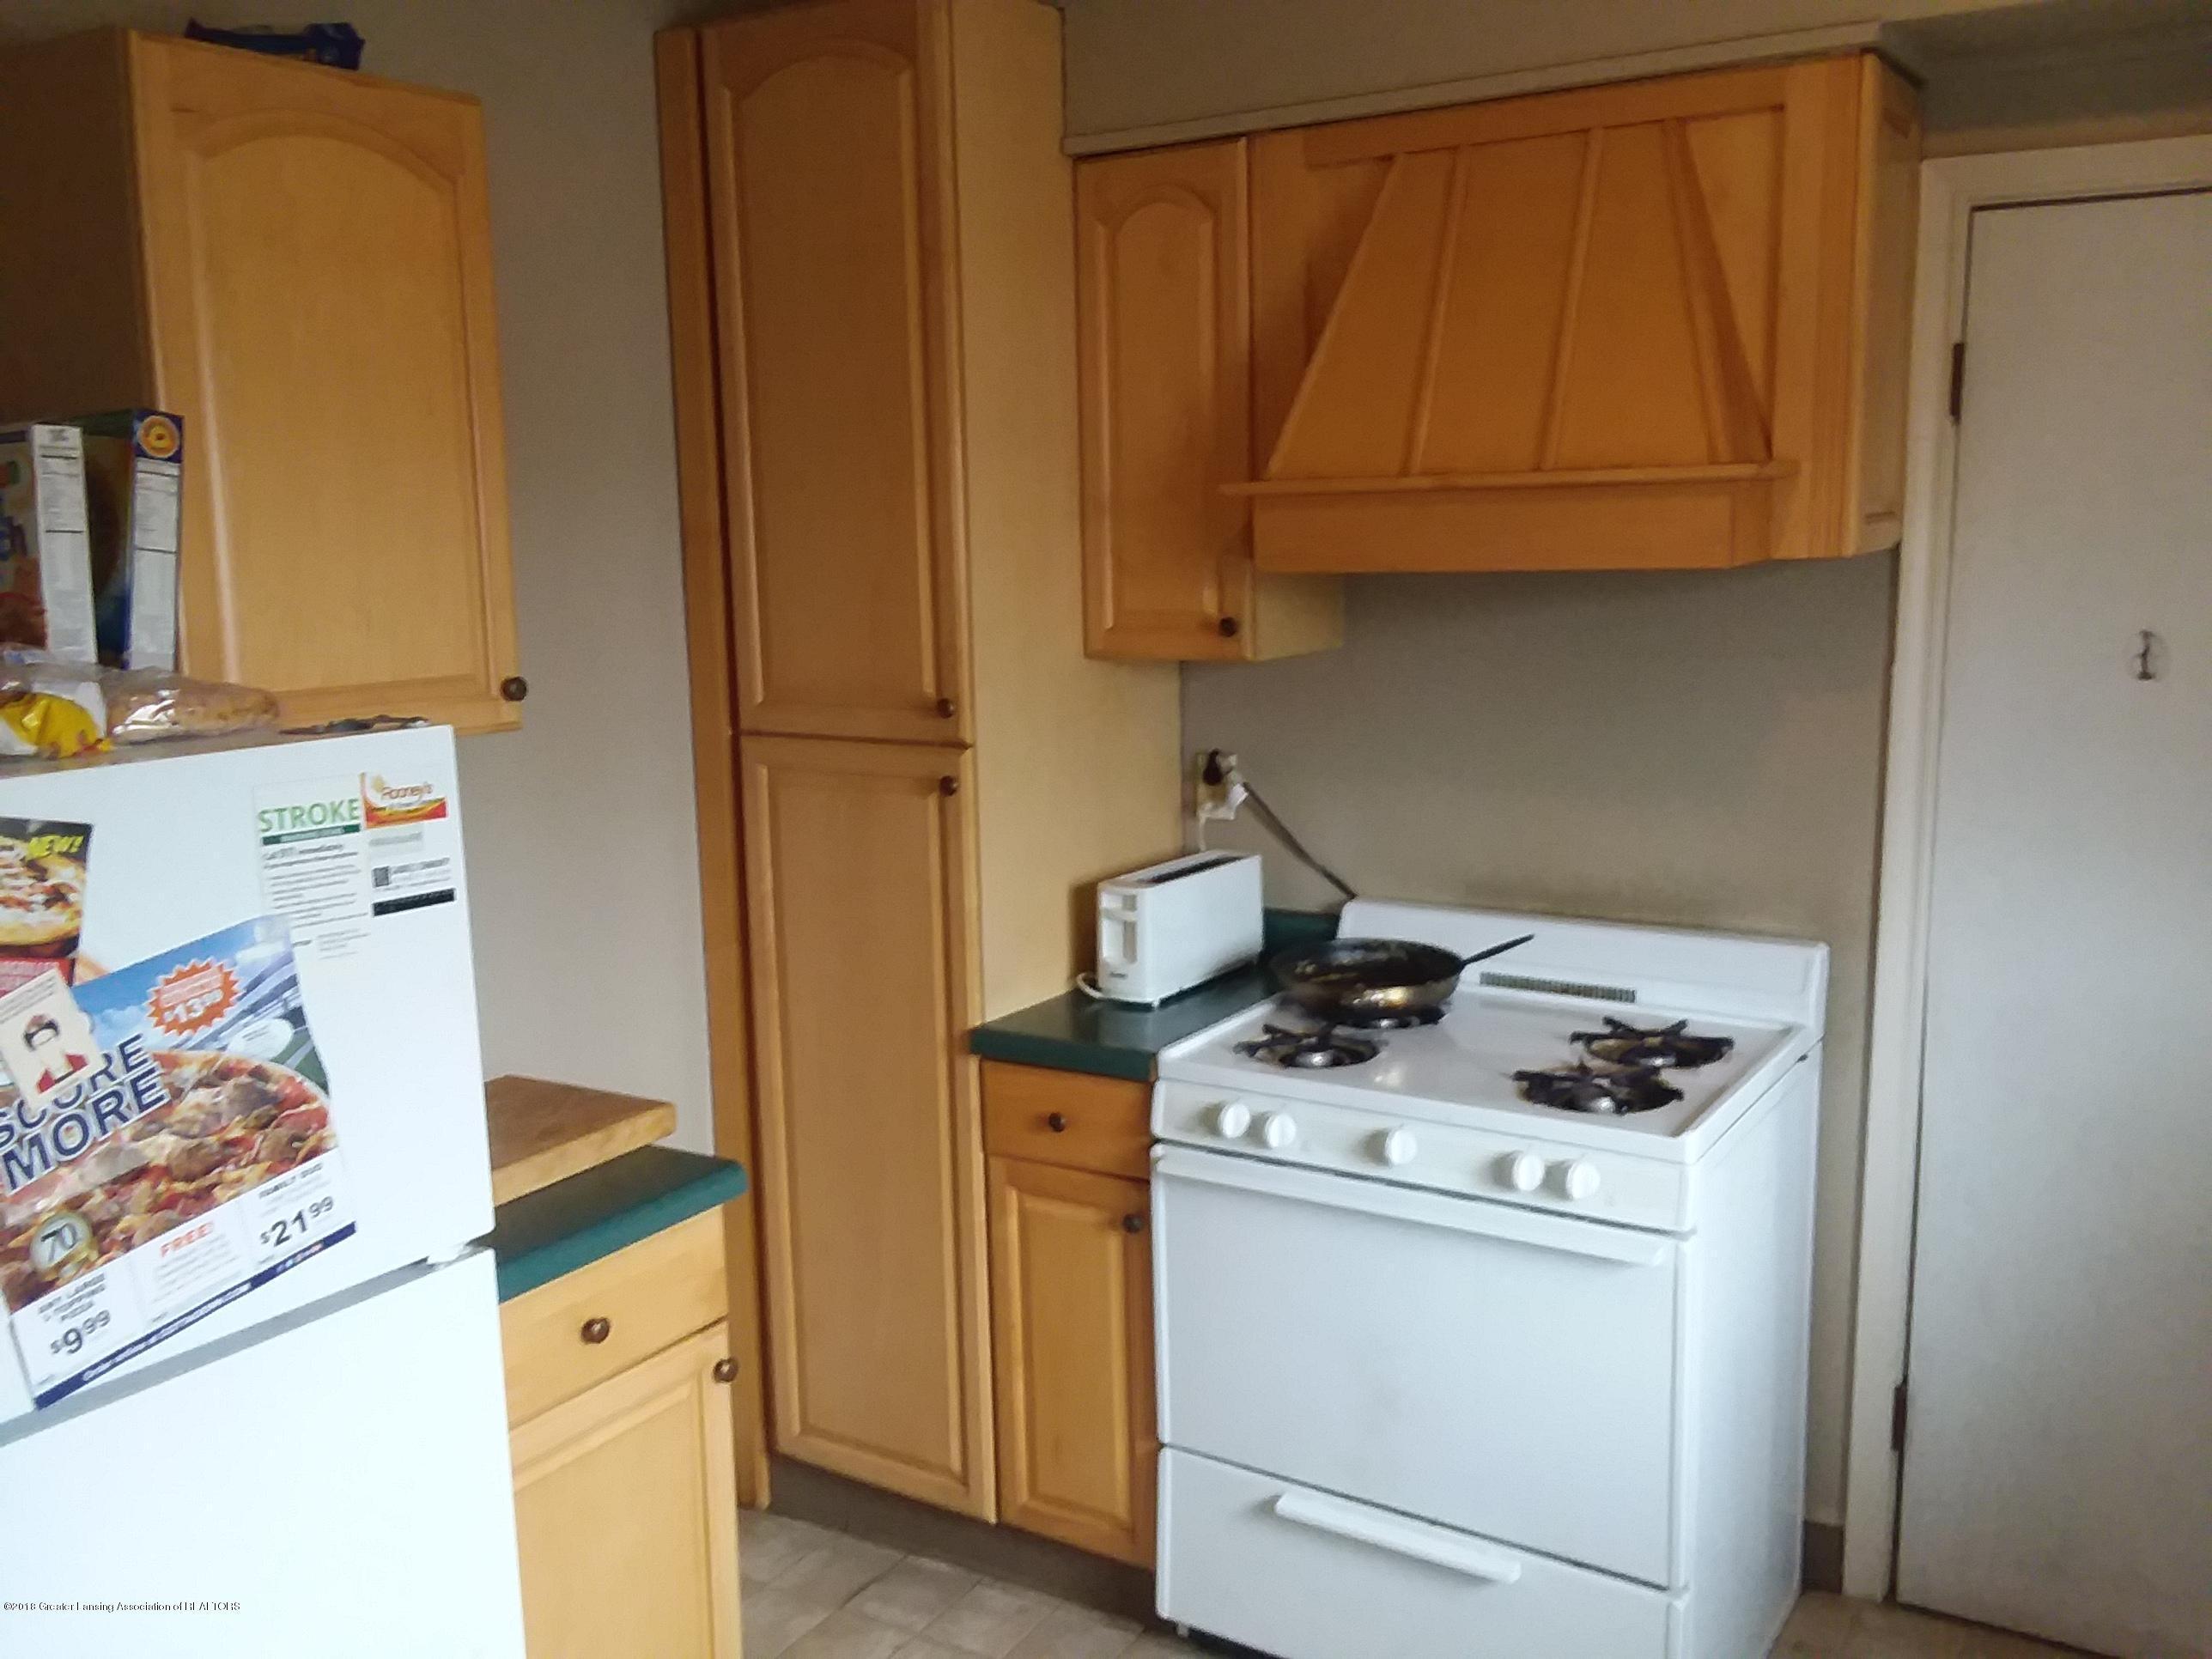 319 W Shiawassee St - kitchen 2 - 6